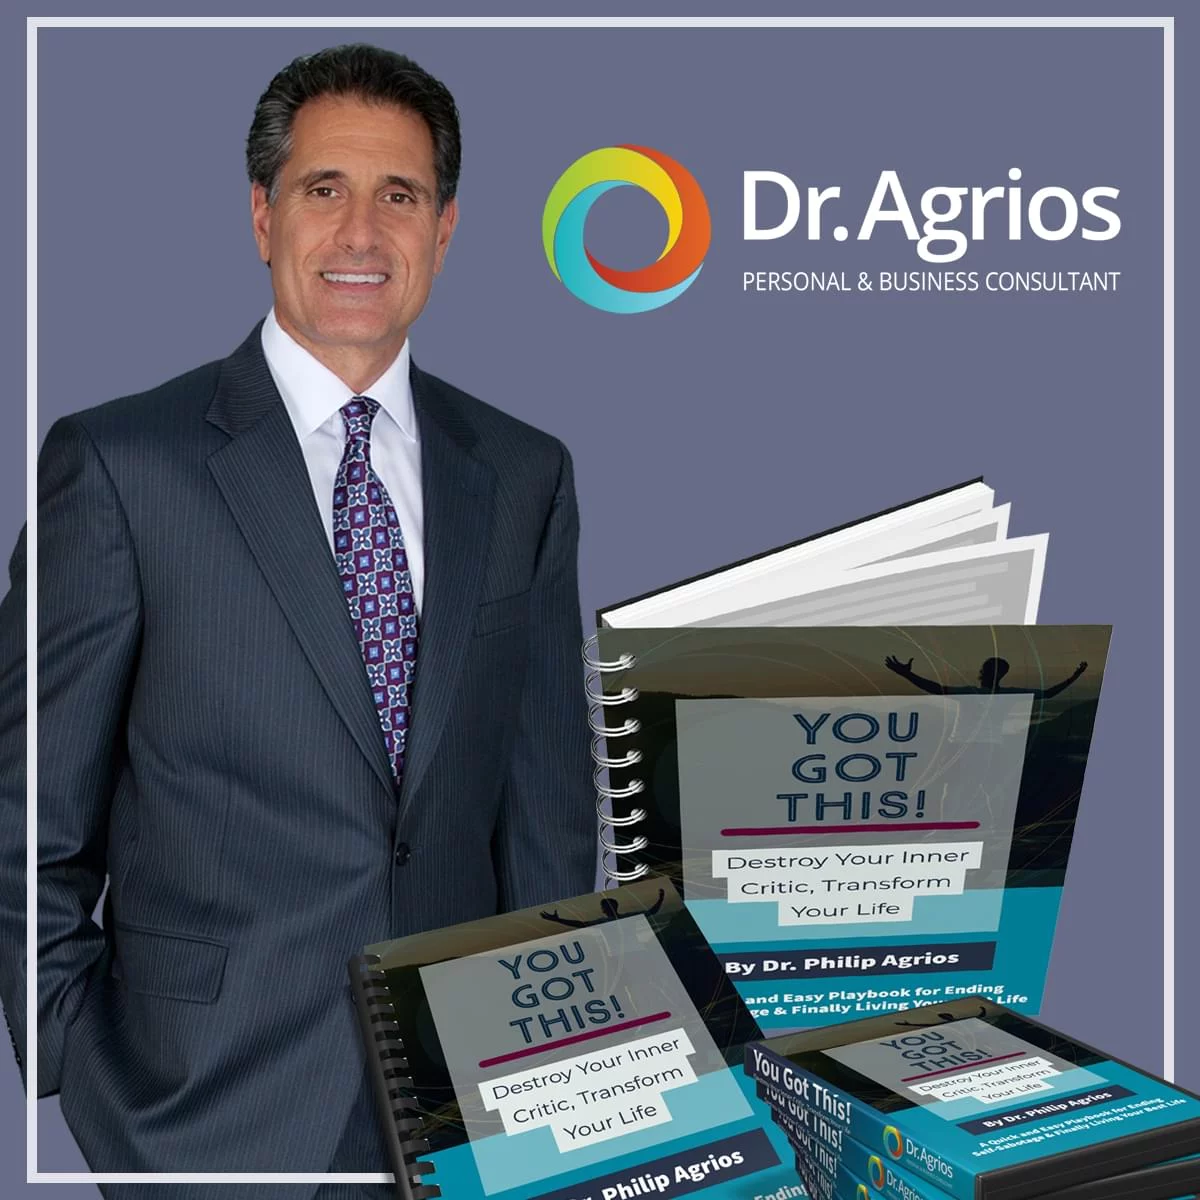 Dr. Agrios